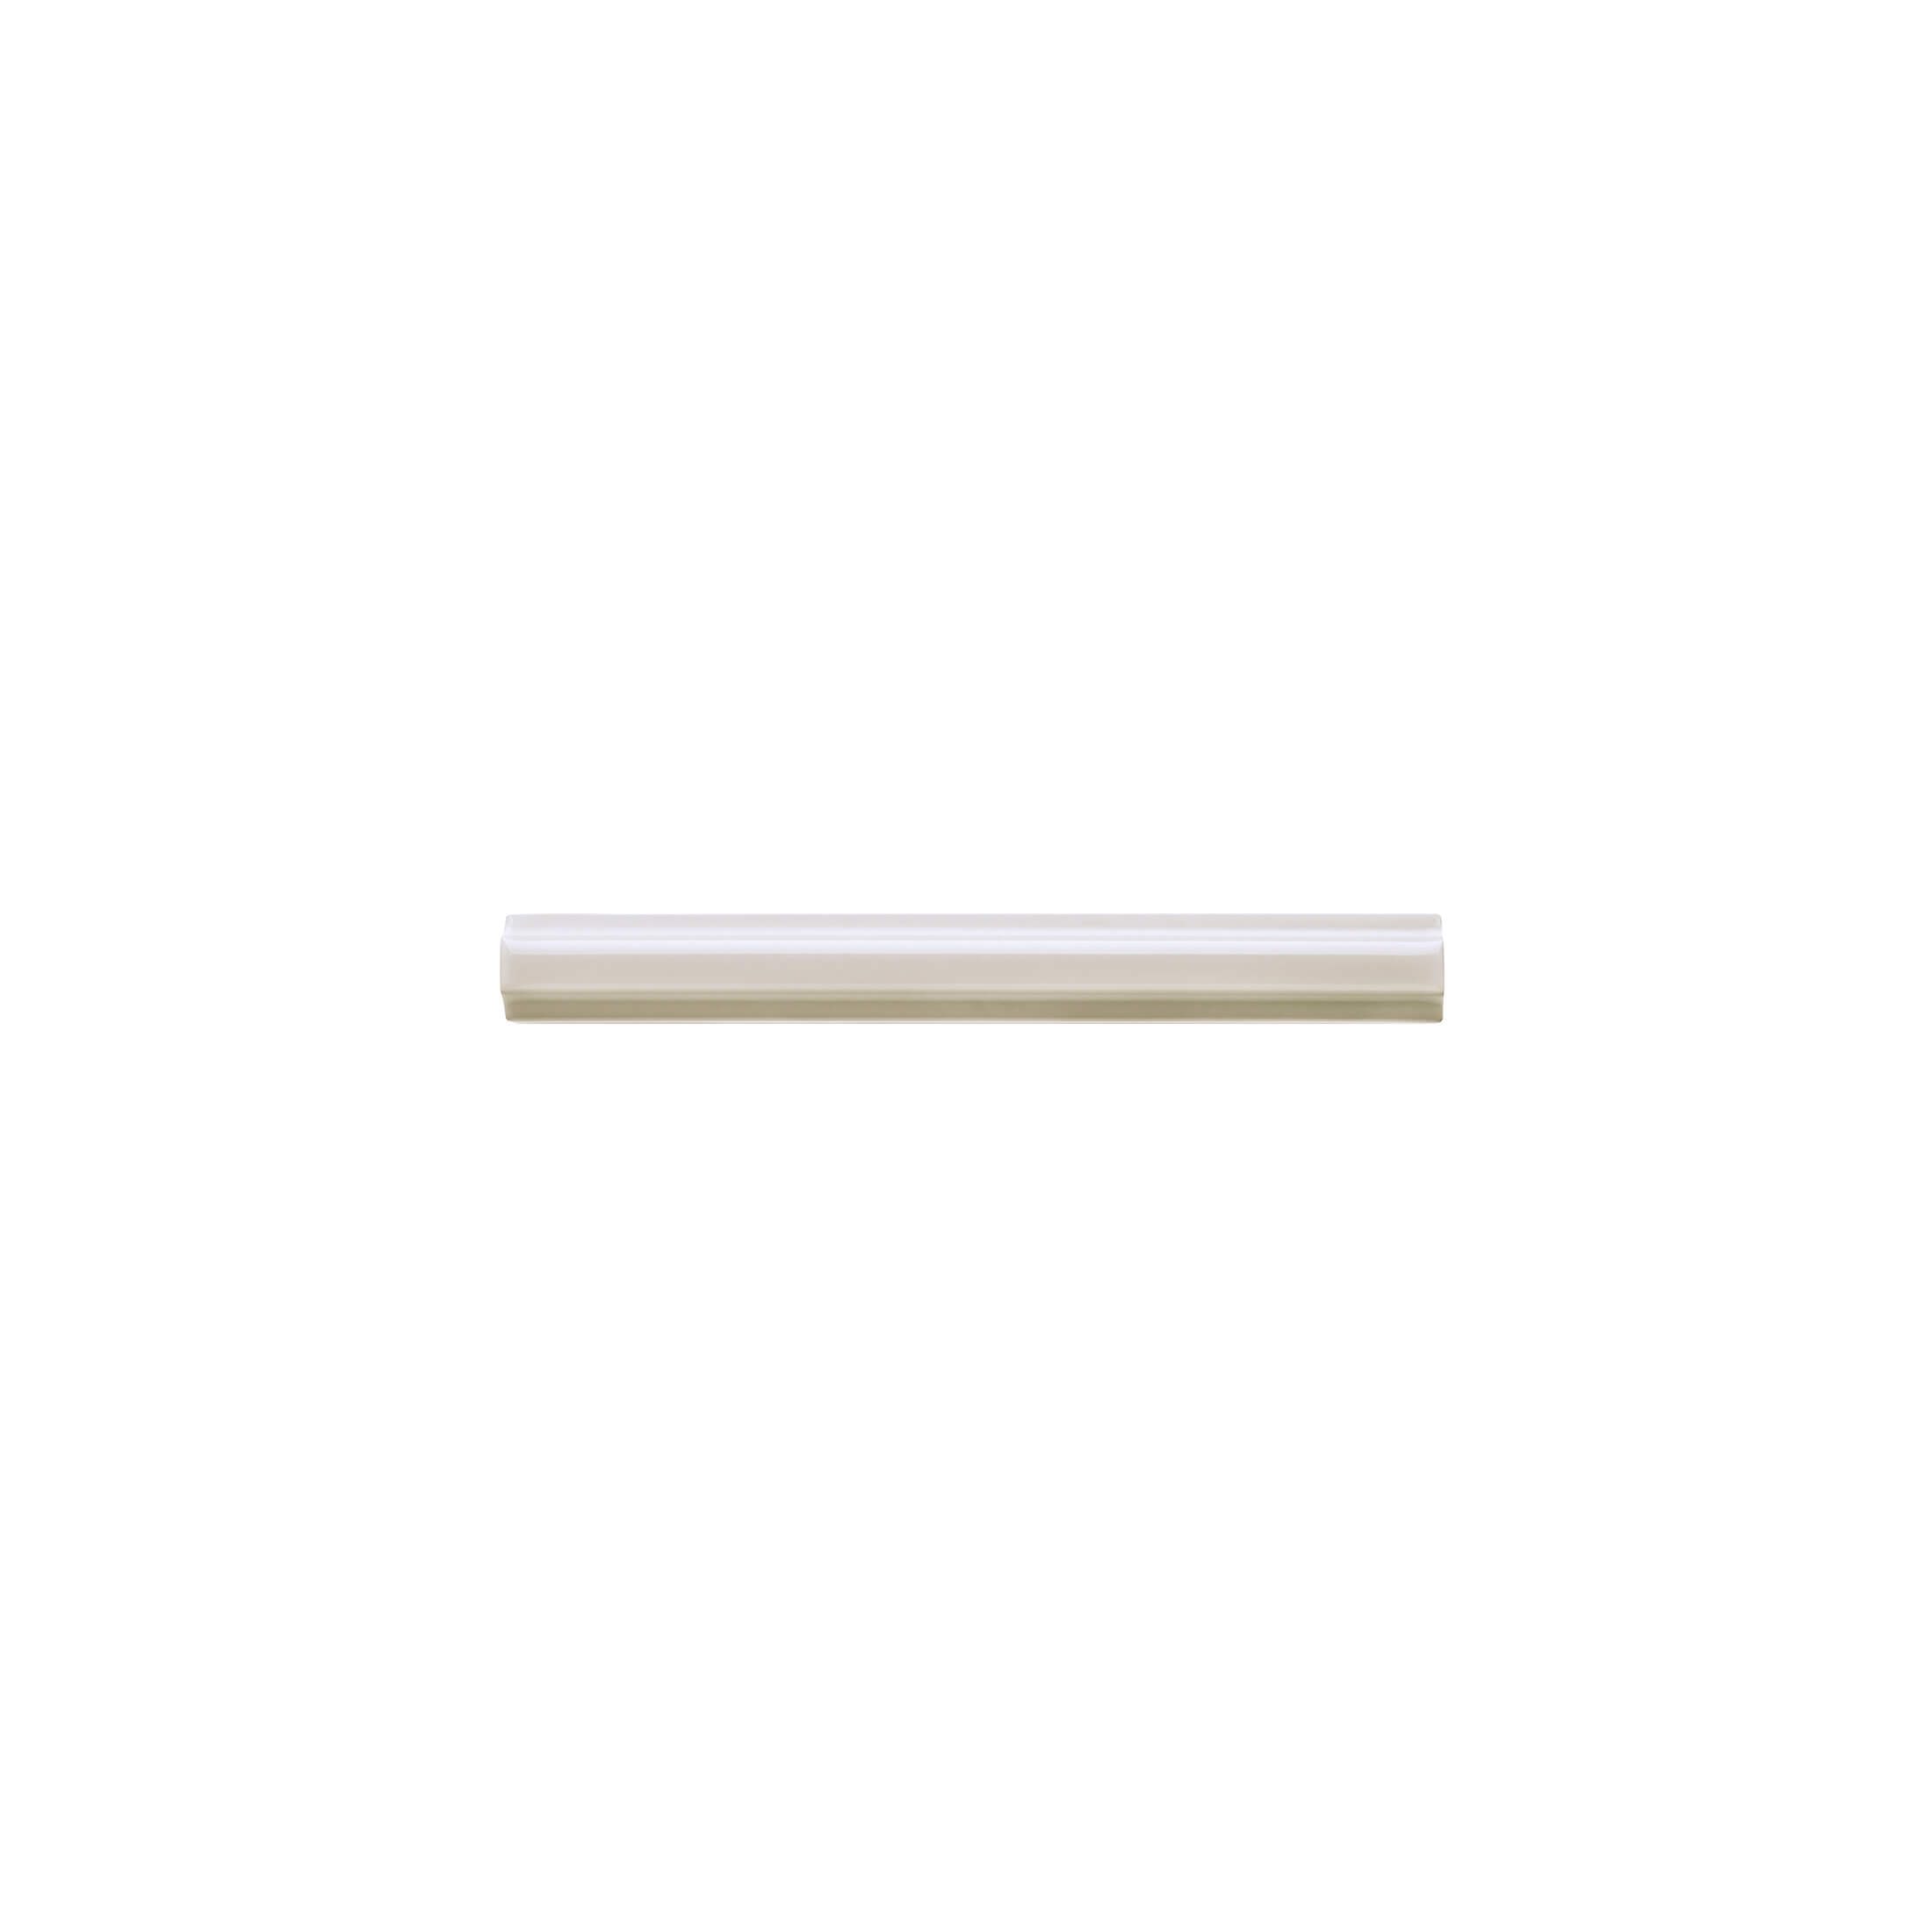 ADNE5495 - LISTELO CLASICO - 1.7 cm X 15 cm